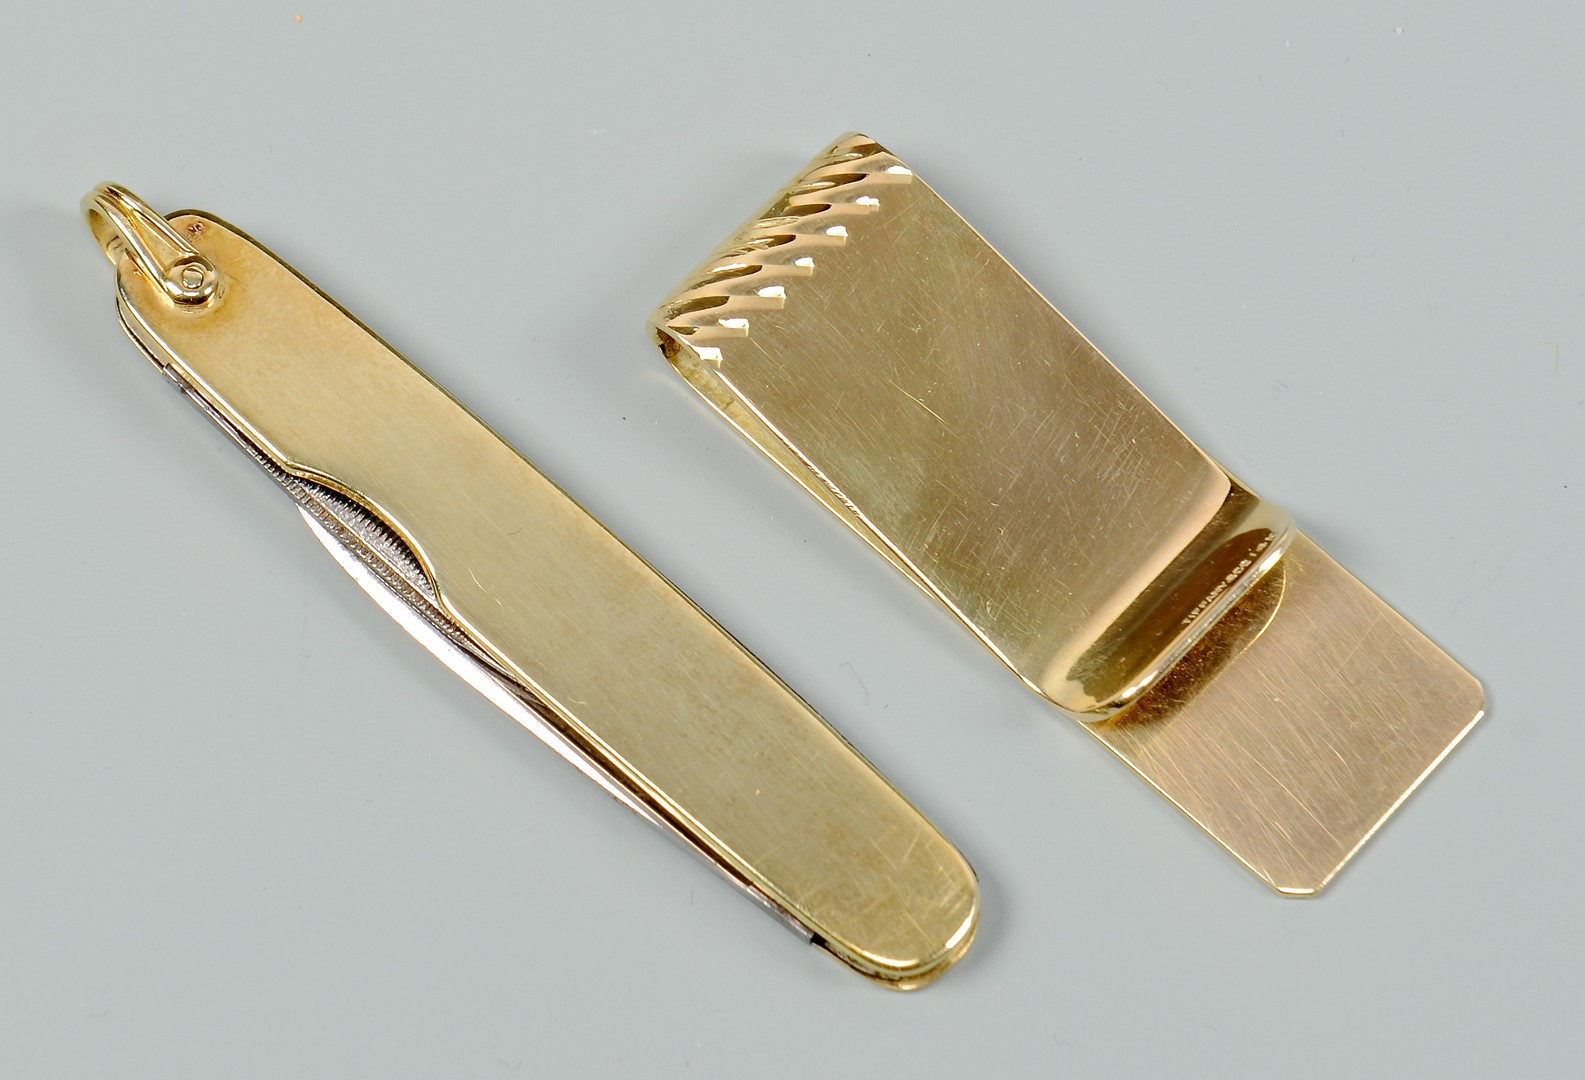 Lot 352: Tiffany & Co. 14K Money Clip & Pocket Knife